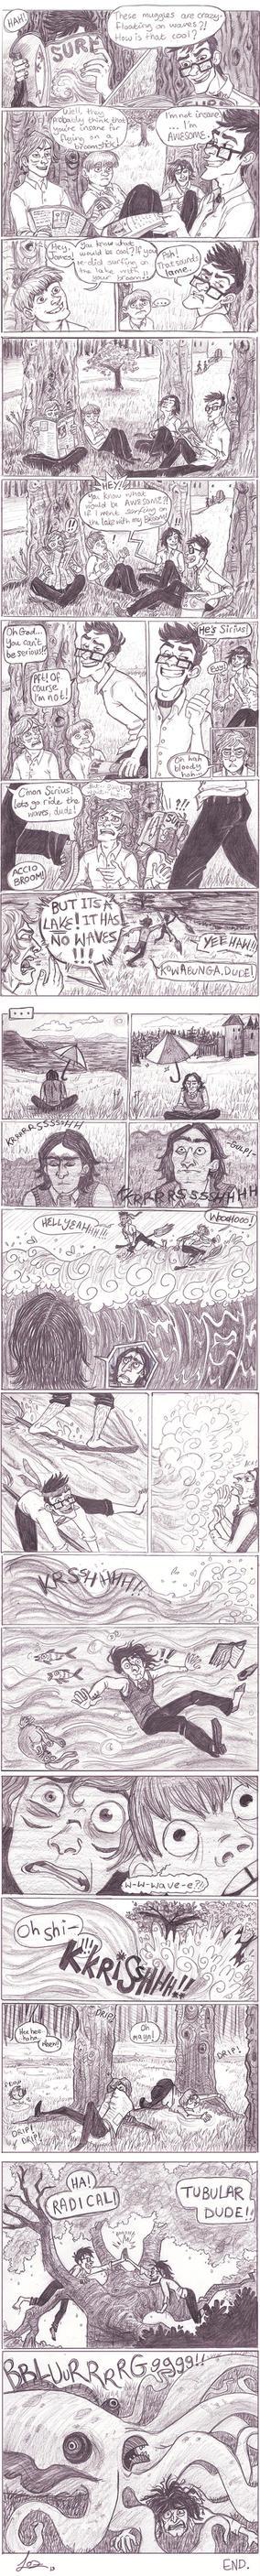 Wizard Surfing by Alatariel-Amandil